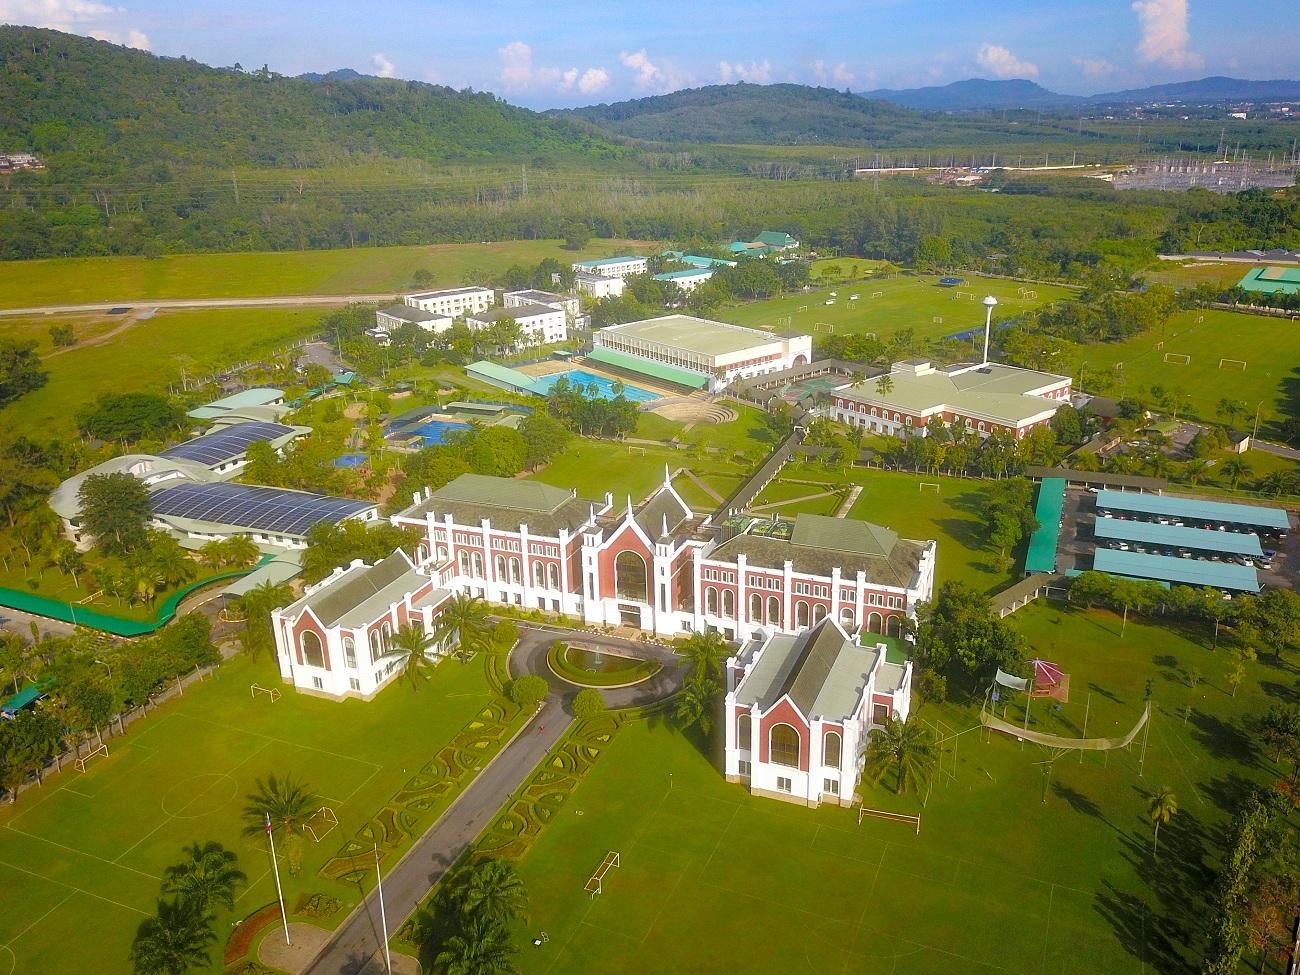 British International School, Phuket (BISP)